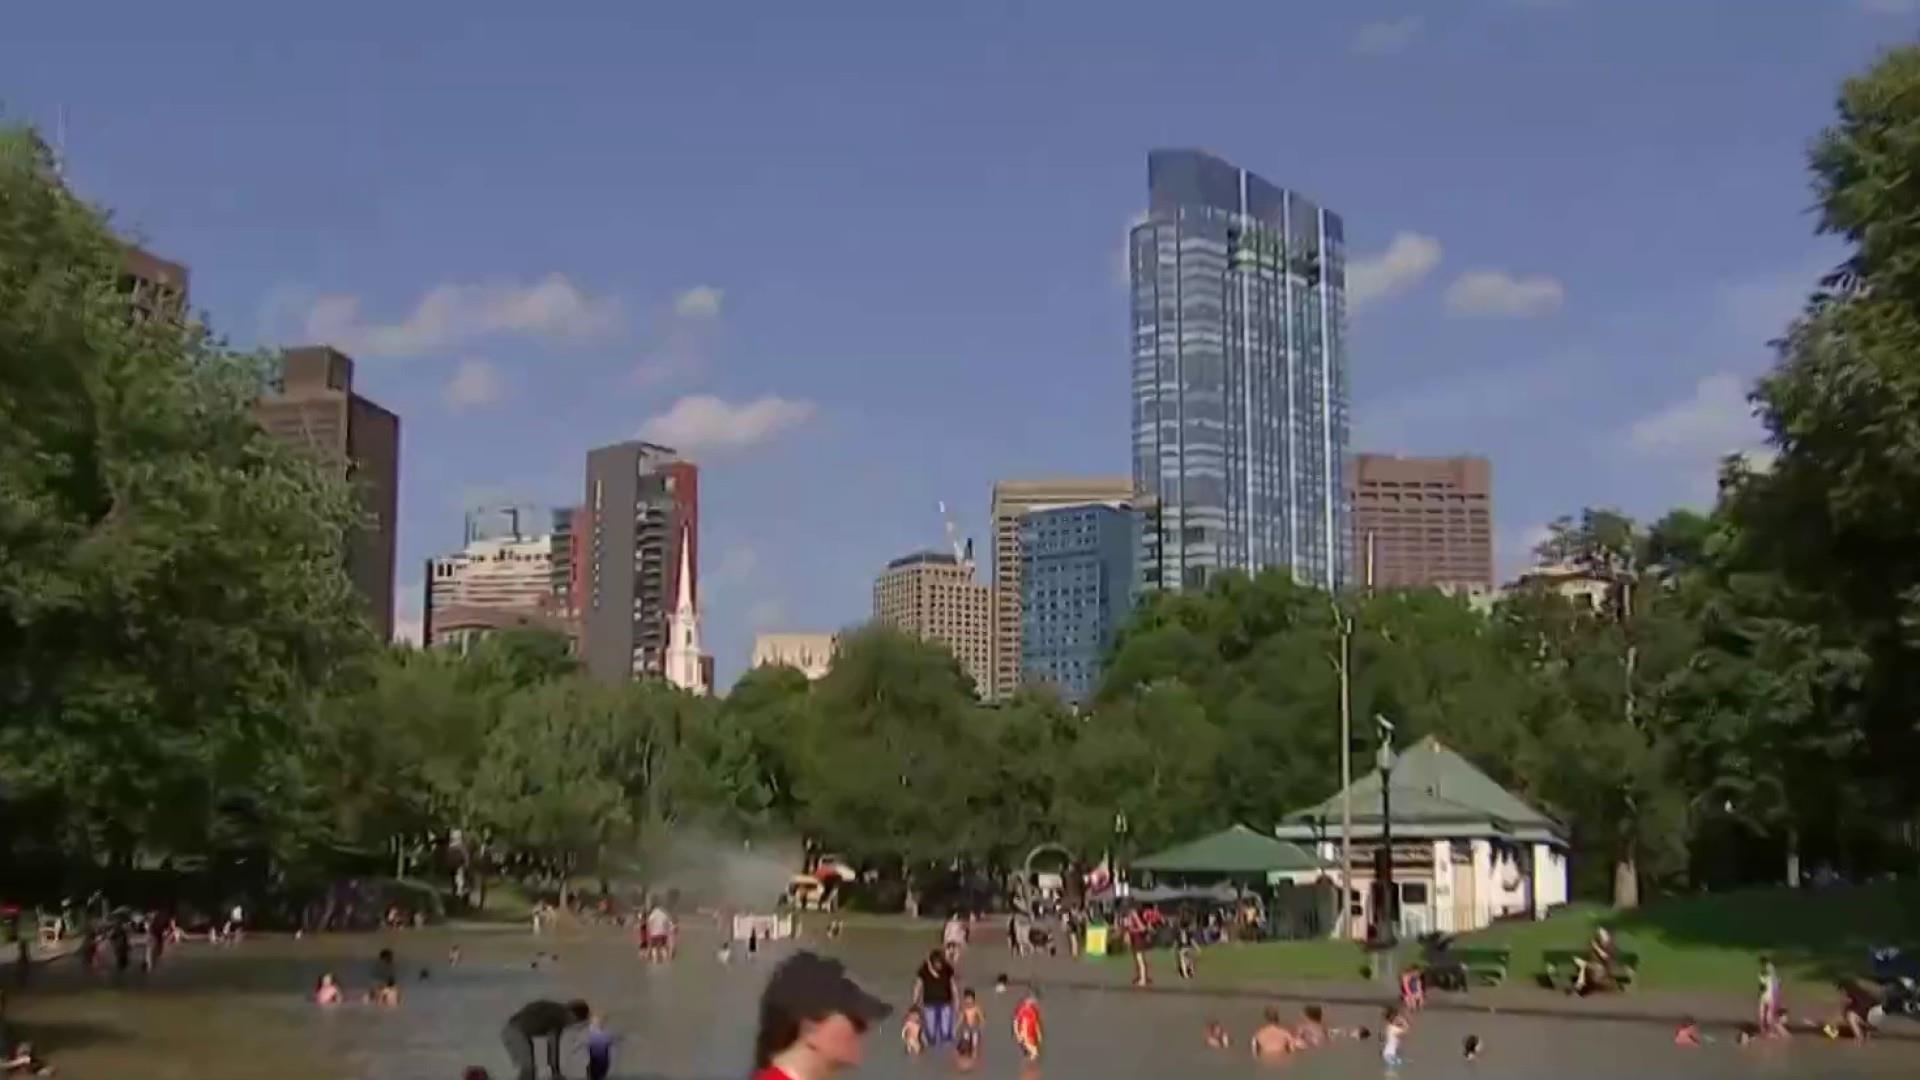 Heat wave impacting millions across U.S.